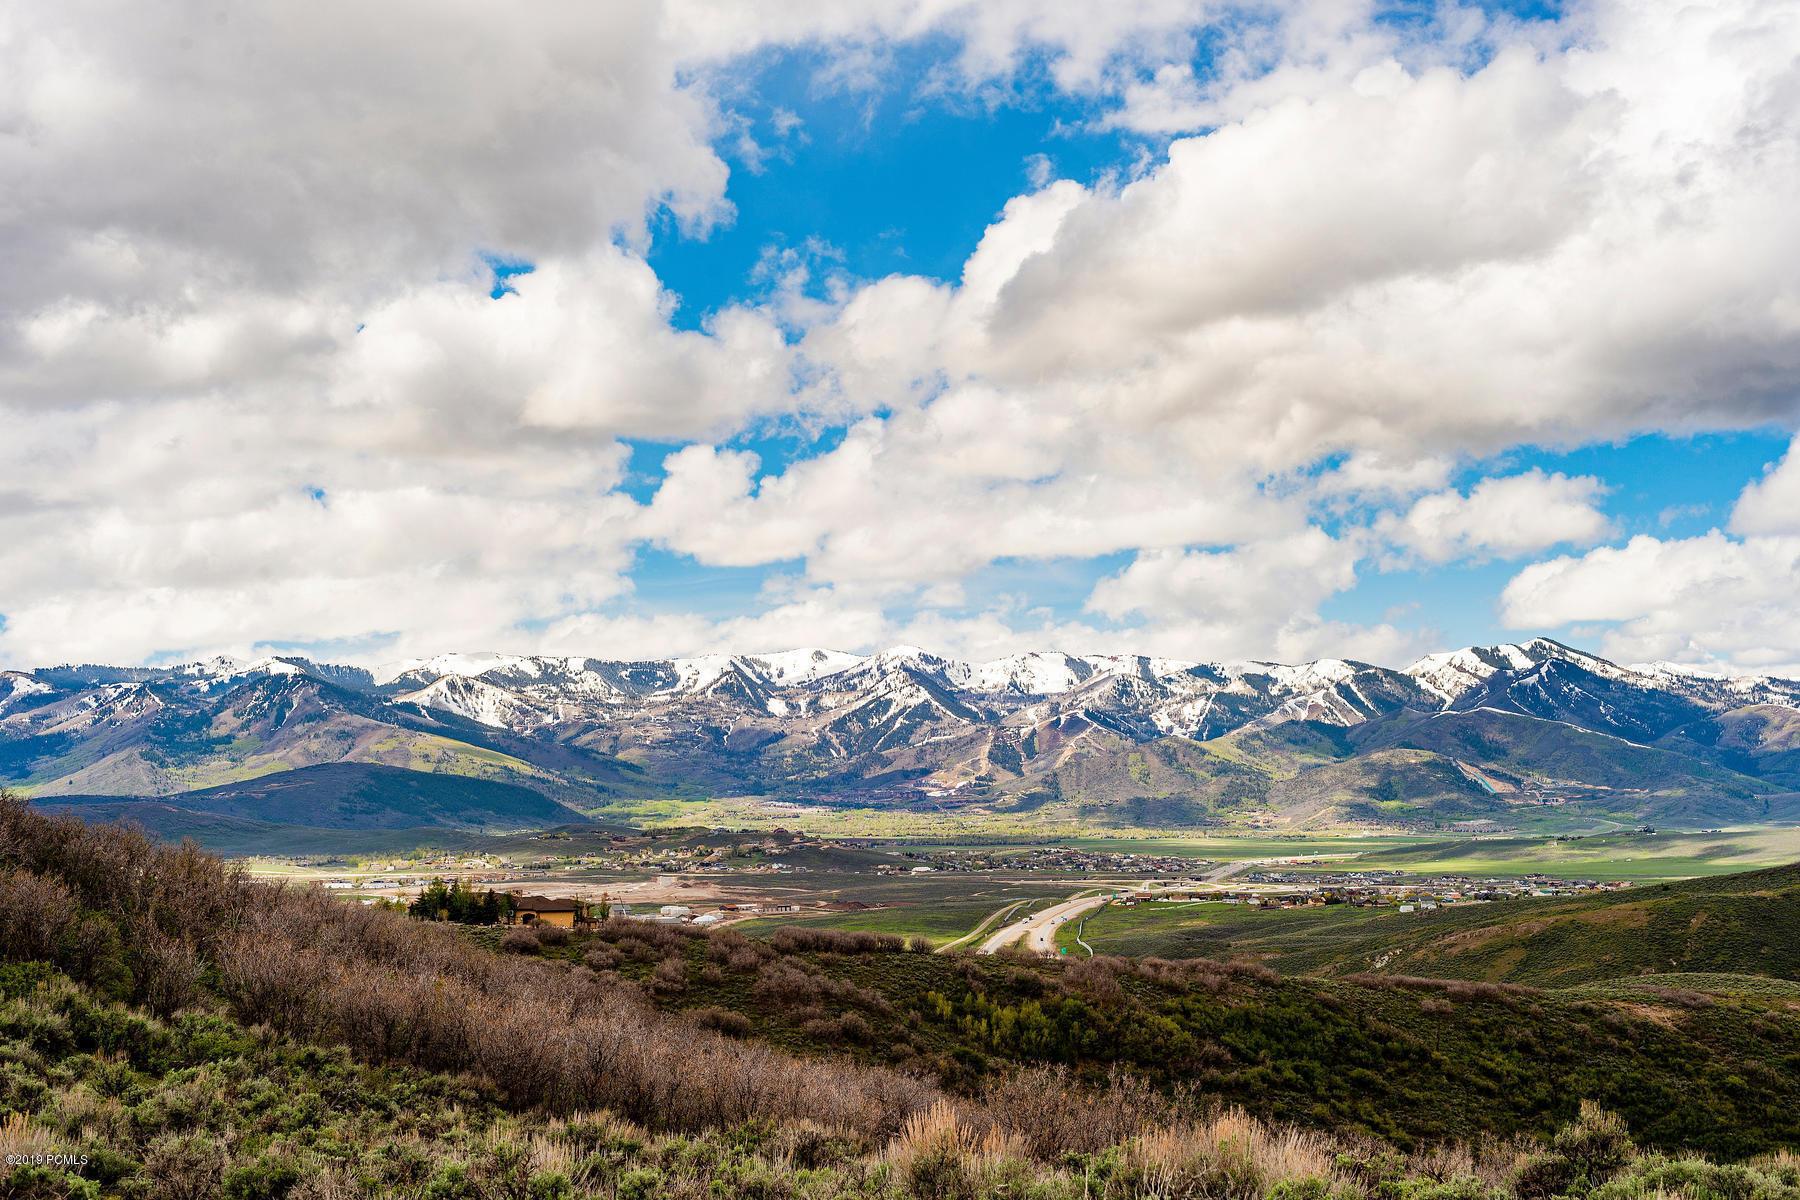 8498 Promontory Rock Road, Park City, Utah 84098, ,Land,For Sale,Promontory Rock,20190109112430415765000000